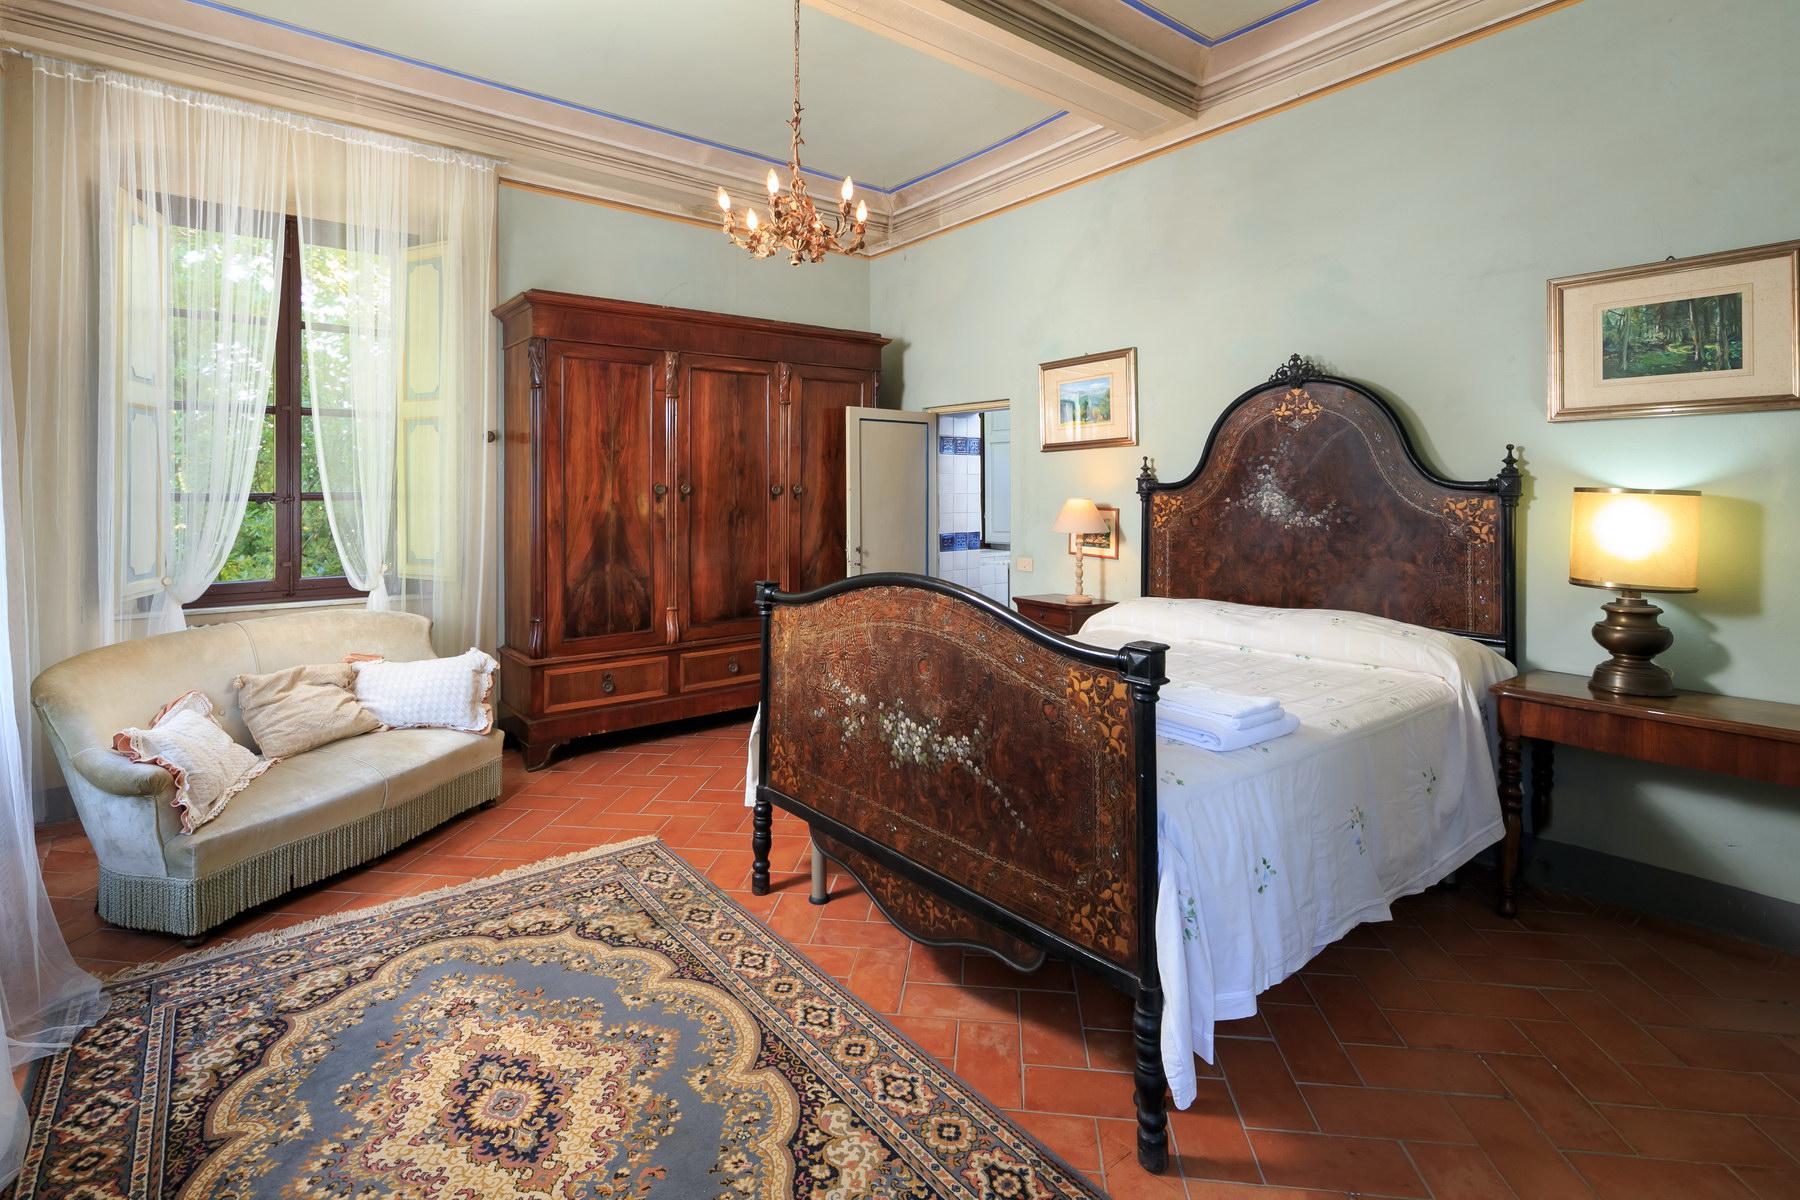 Villa in Vendita a Capannori: 5 locali, 570 mq - Foto 20